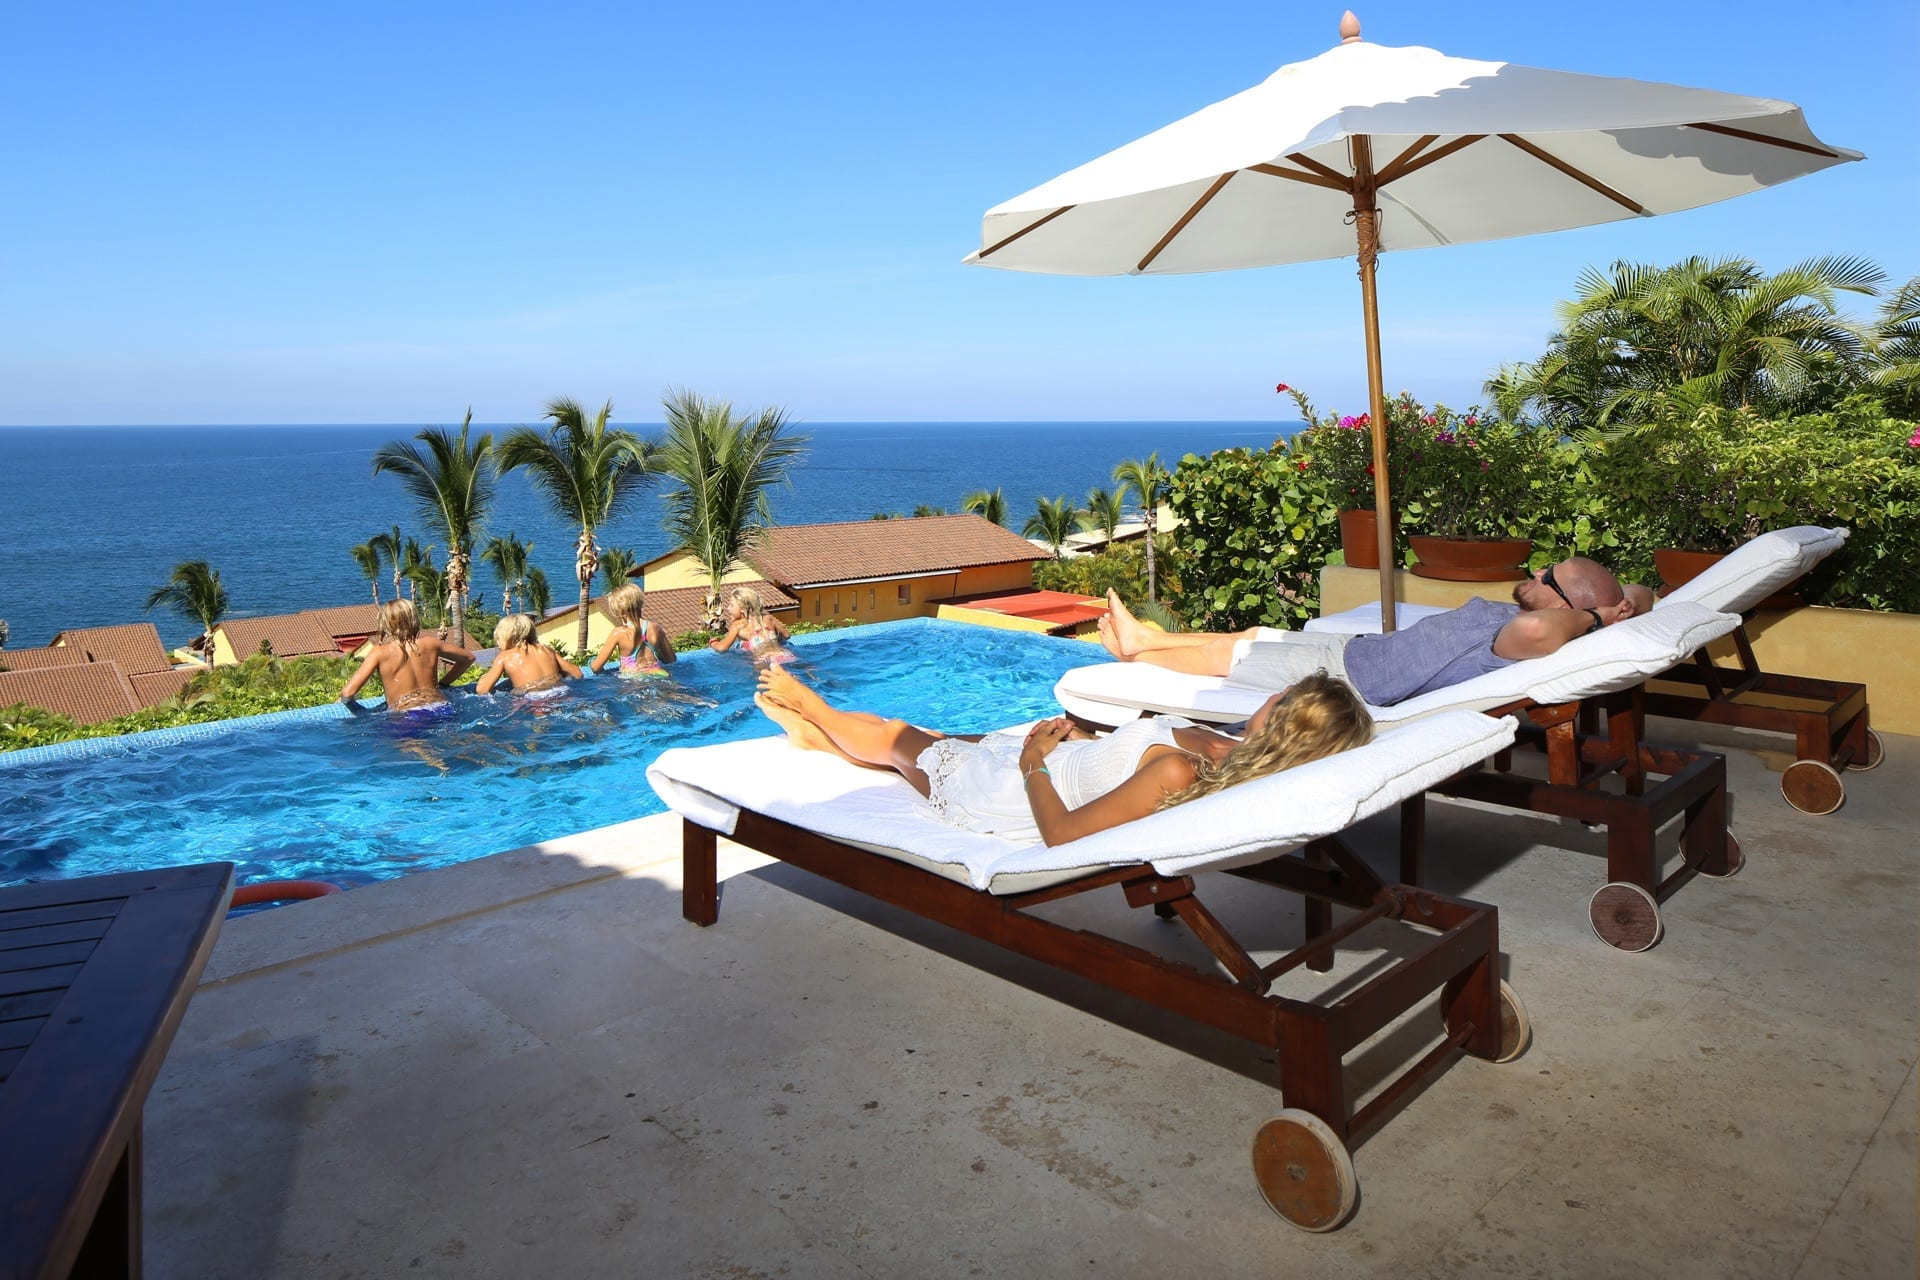 Four Seasons Private Villas Punta Mita